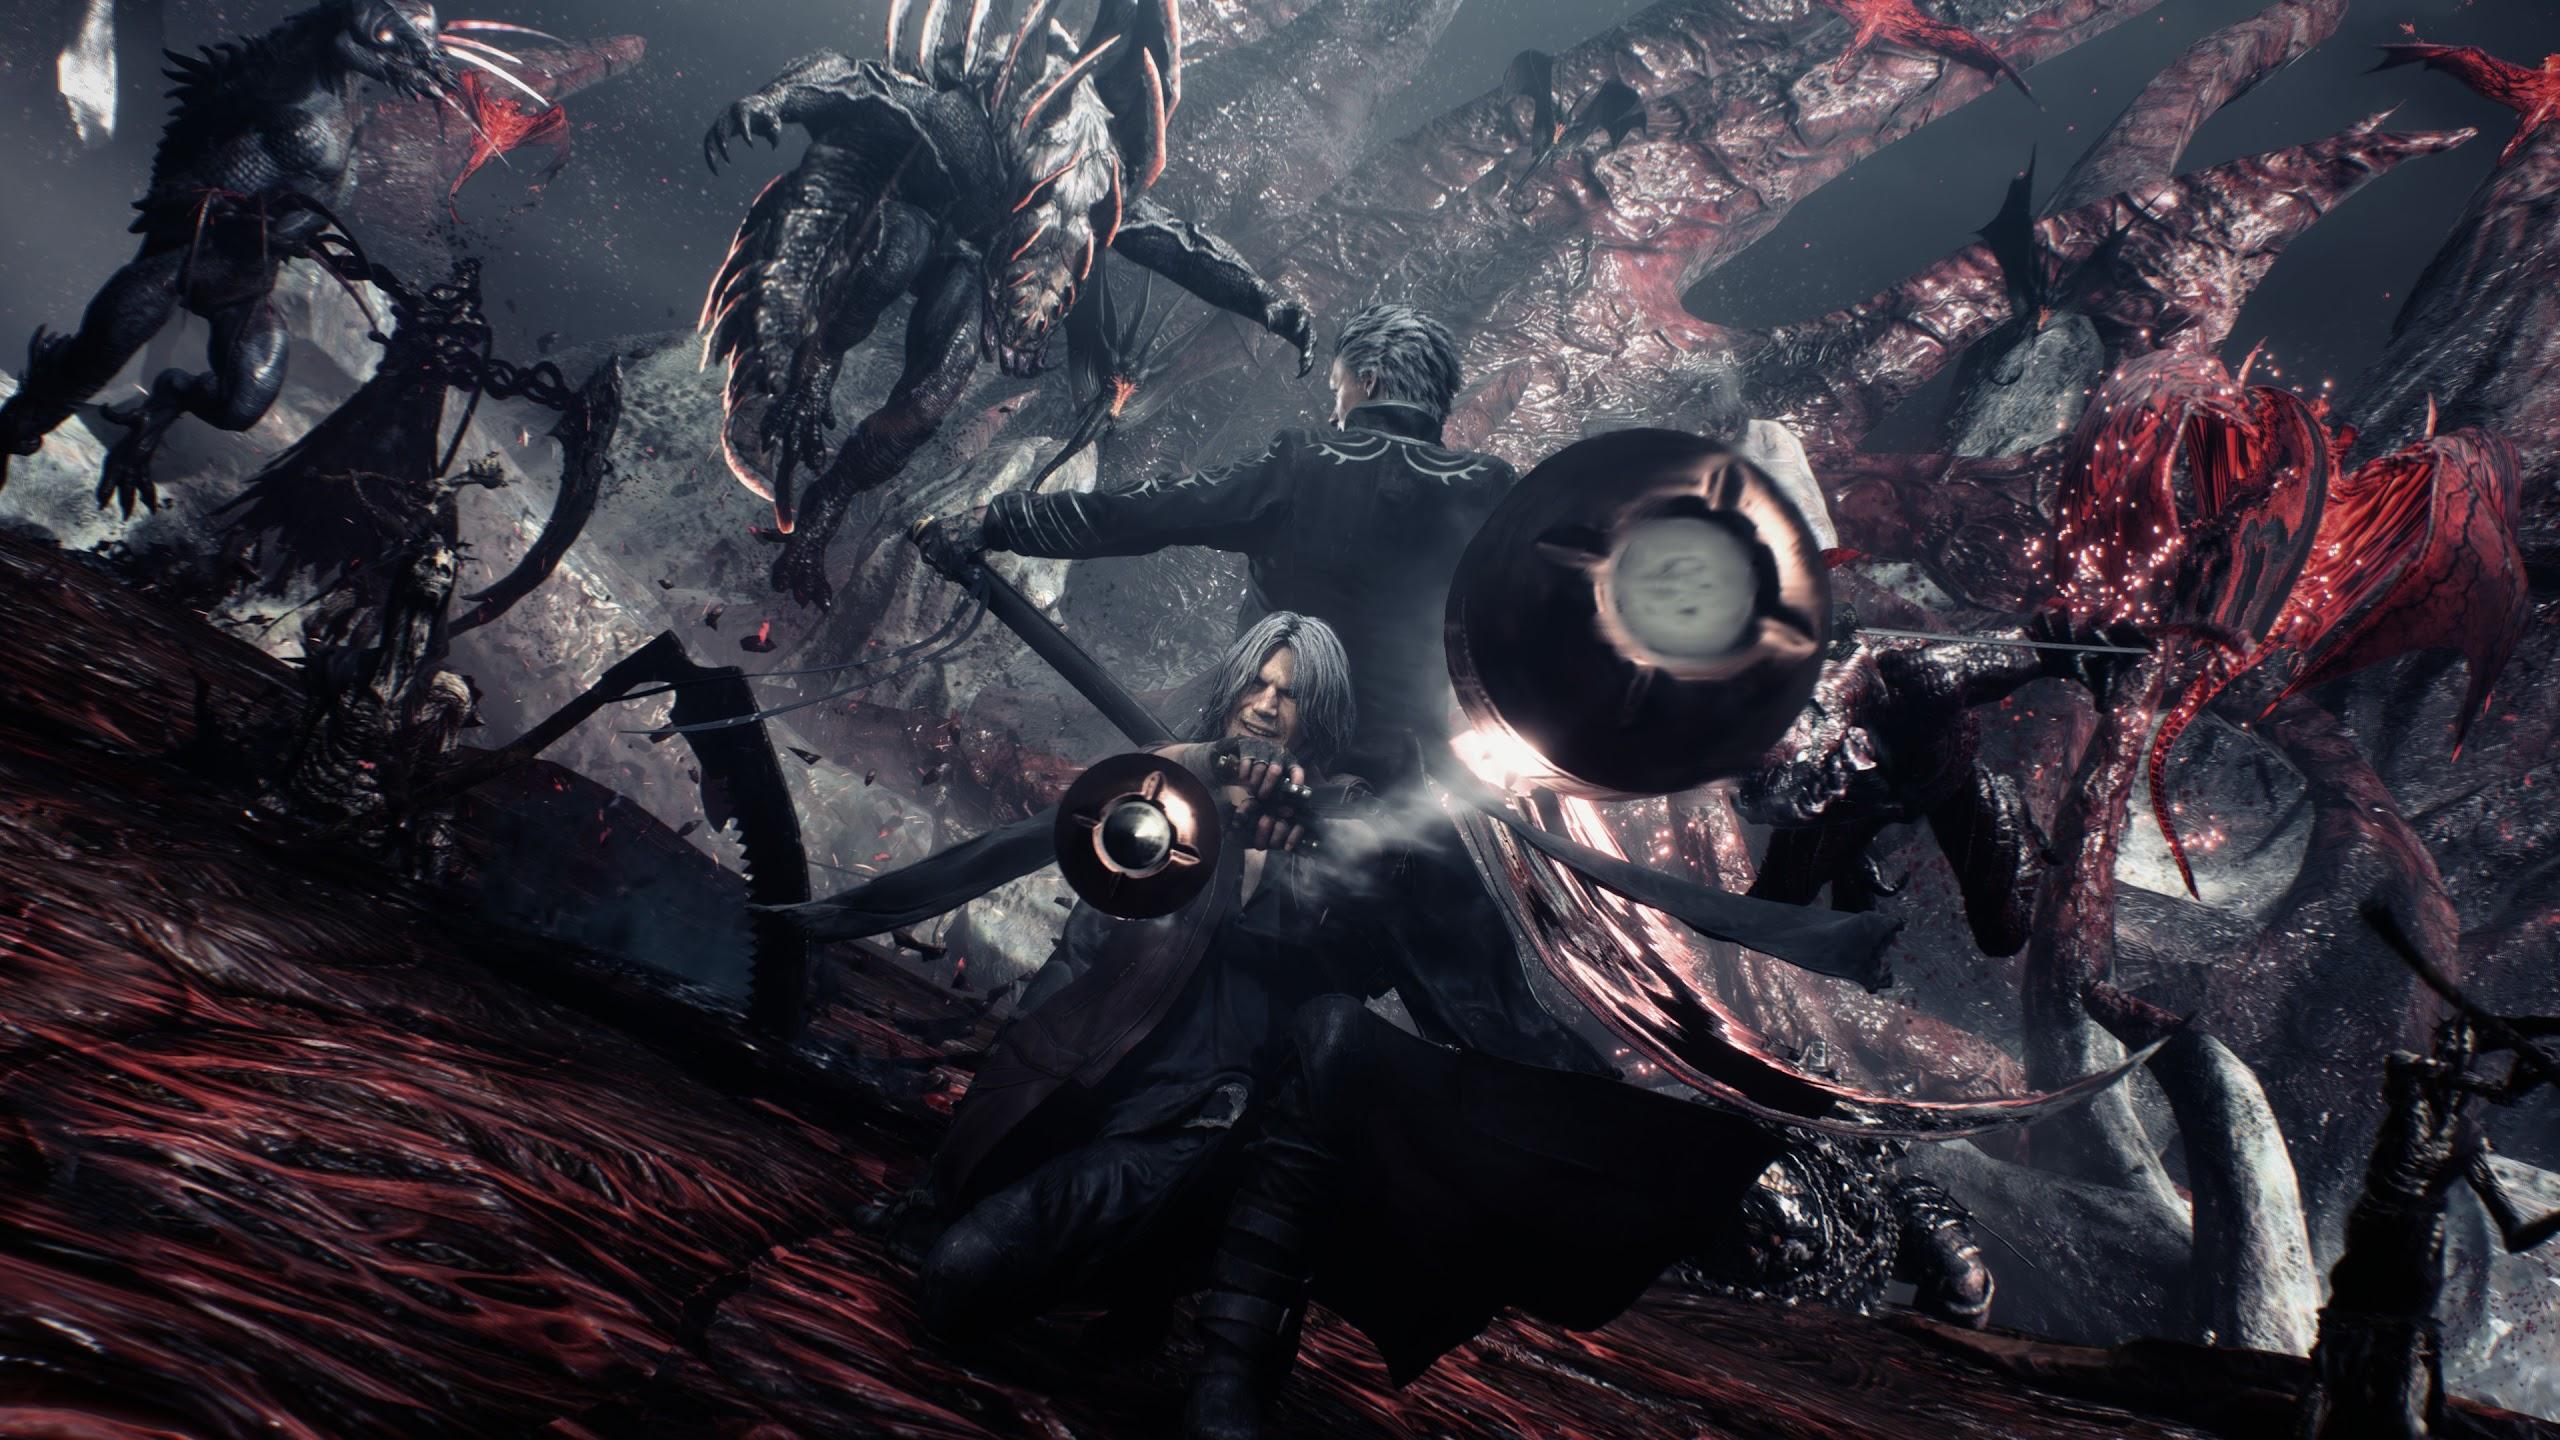 Devil May Cry 5 Dante Vergil 4k Wallpaper 85